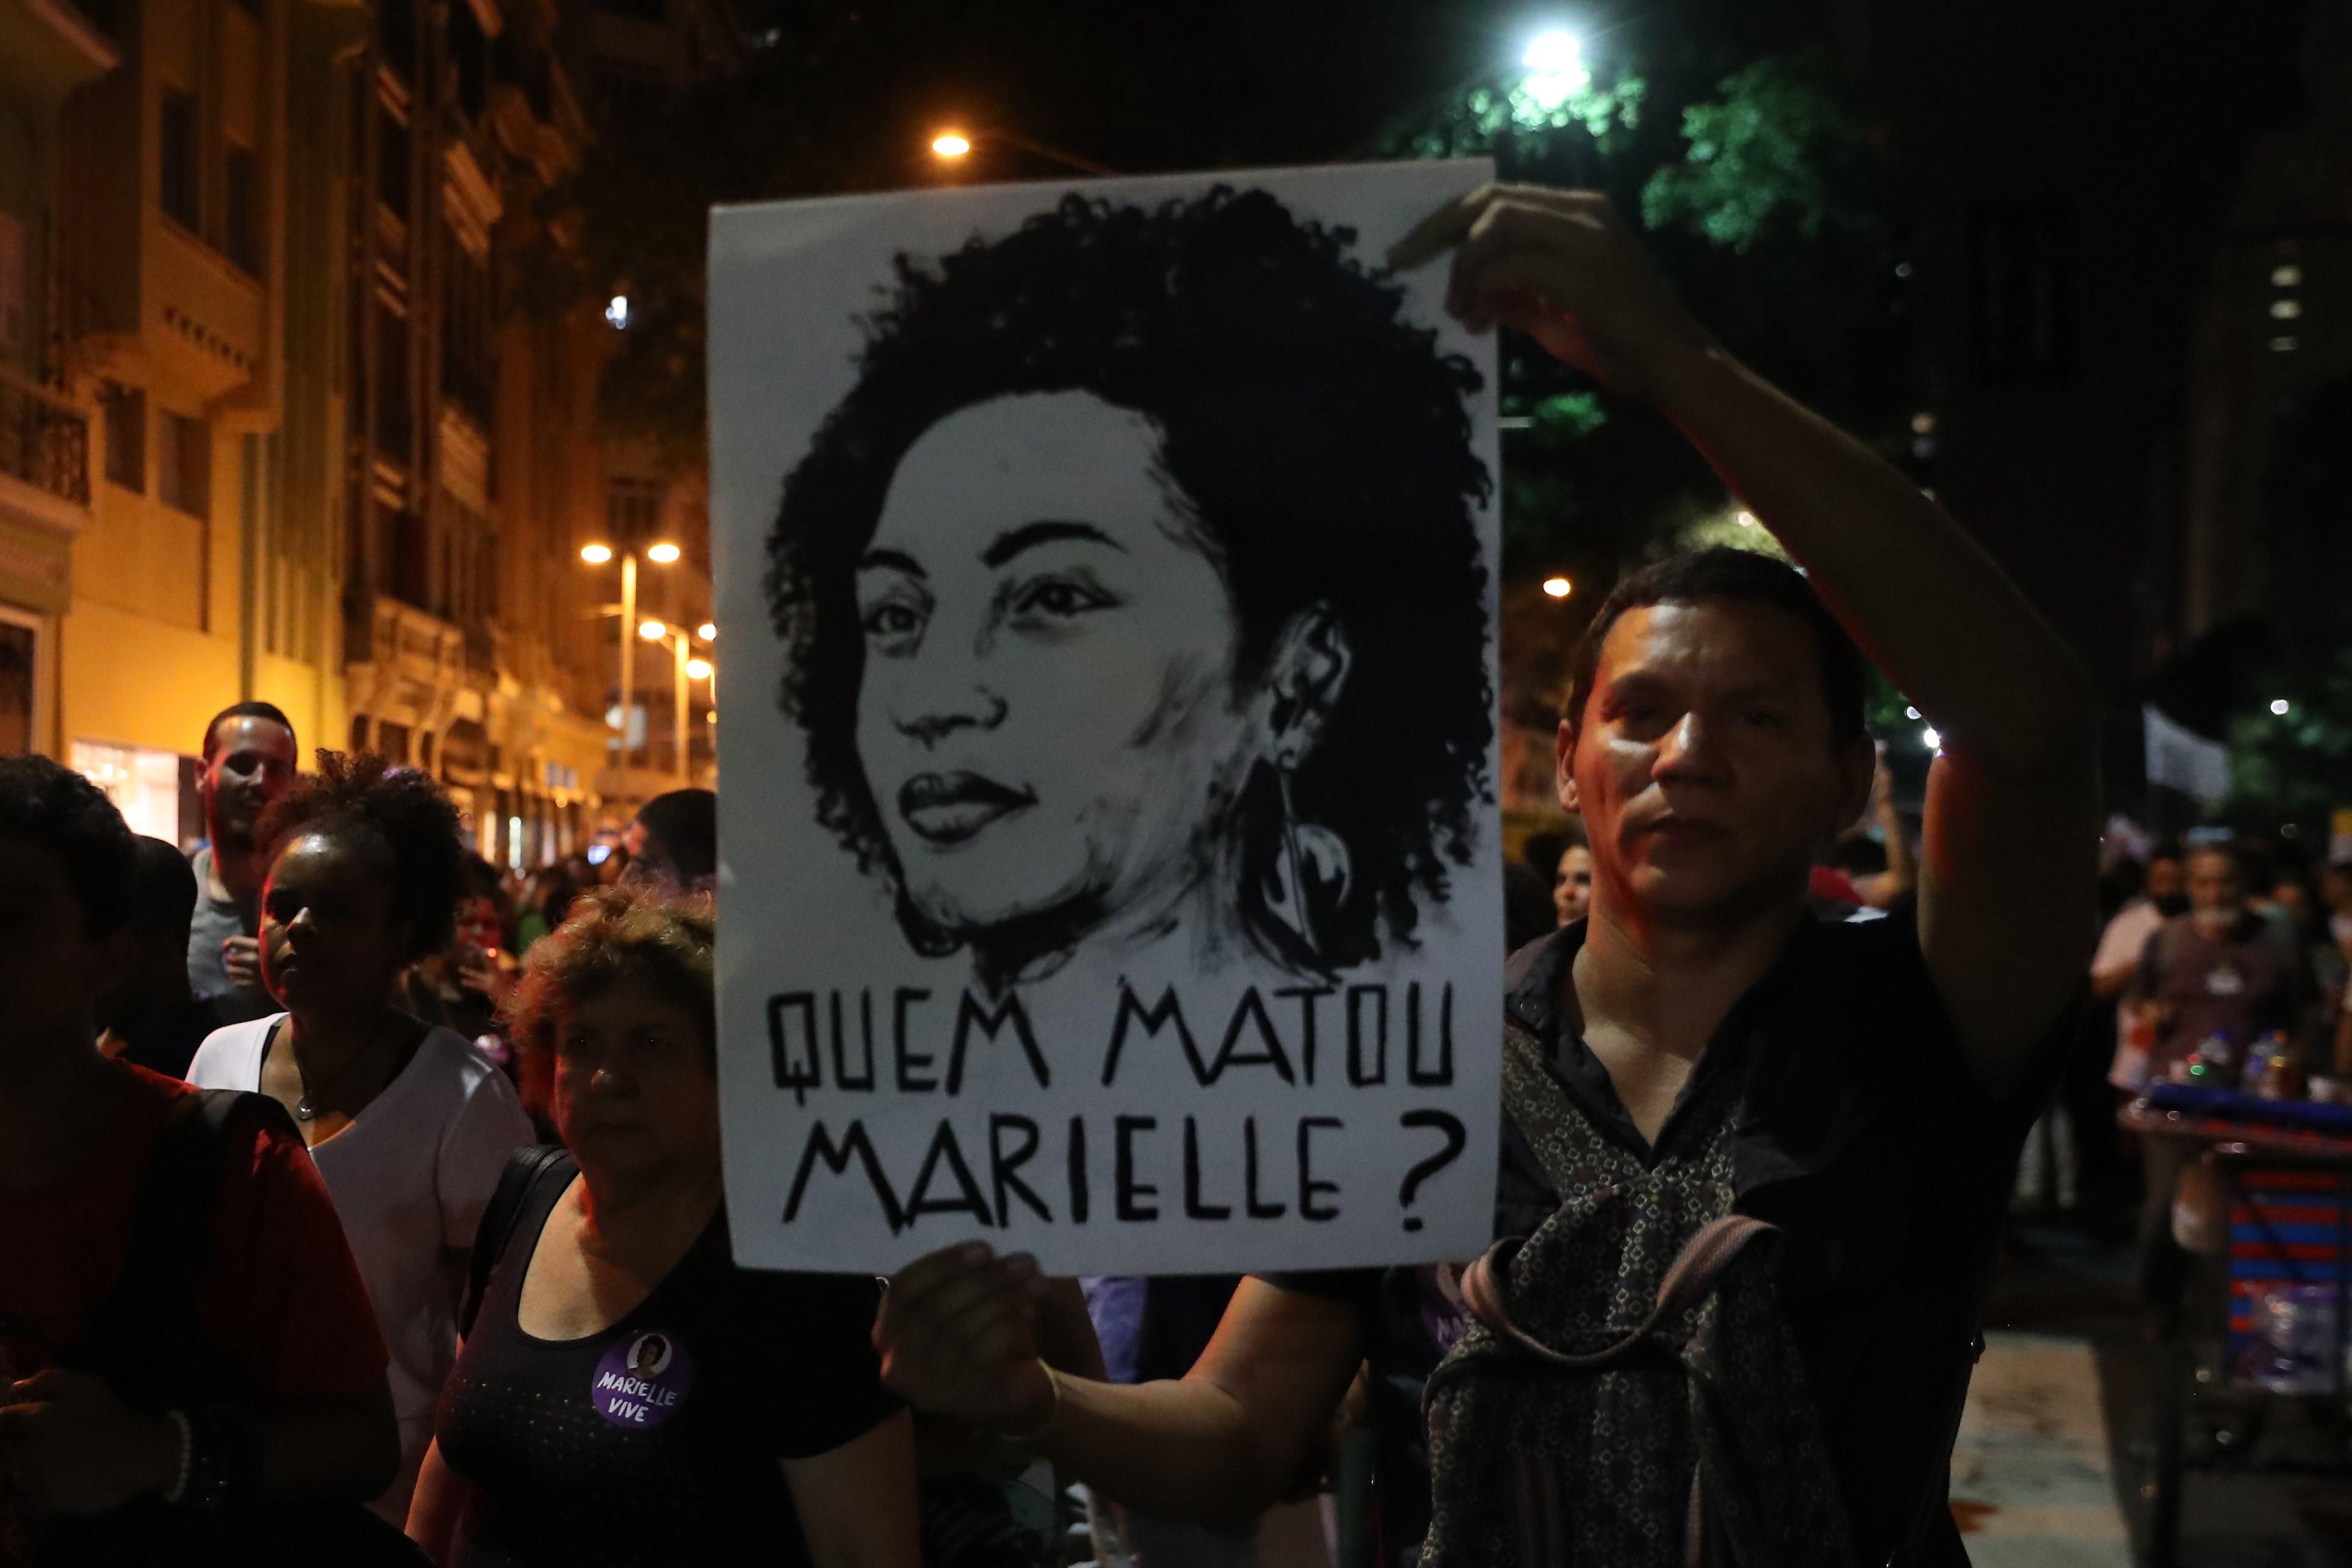 Polícia prende suspeito de homicídio da vereadora Marielle Franco